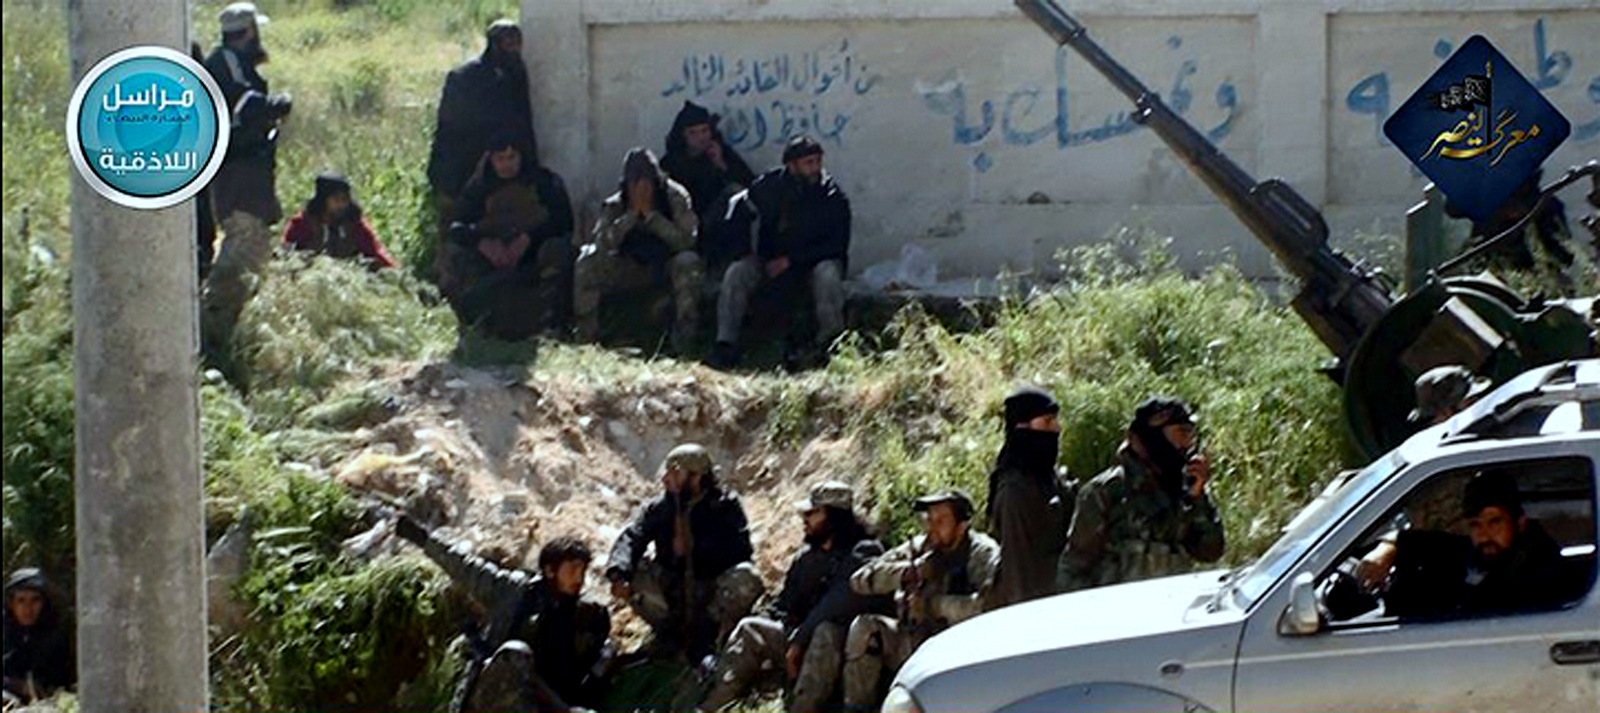 Fighters from Nusra Front,. Al-Qaida's branch in Syria, in the town of Jisr al-Shughour, Idlib province.